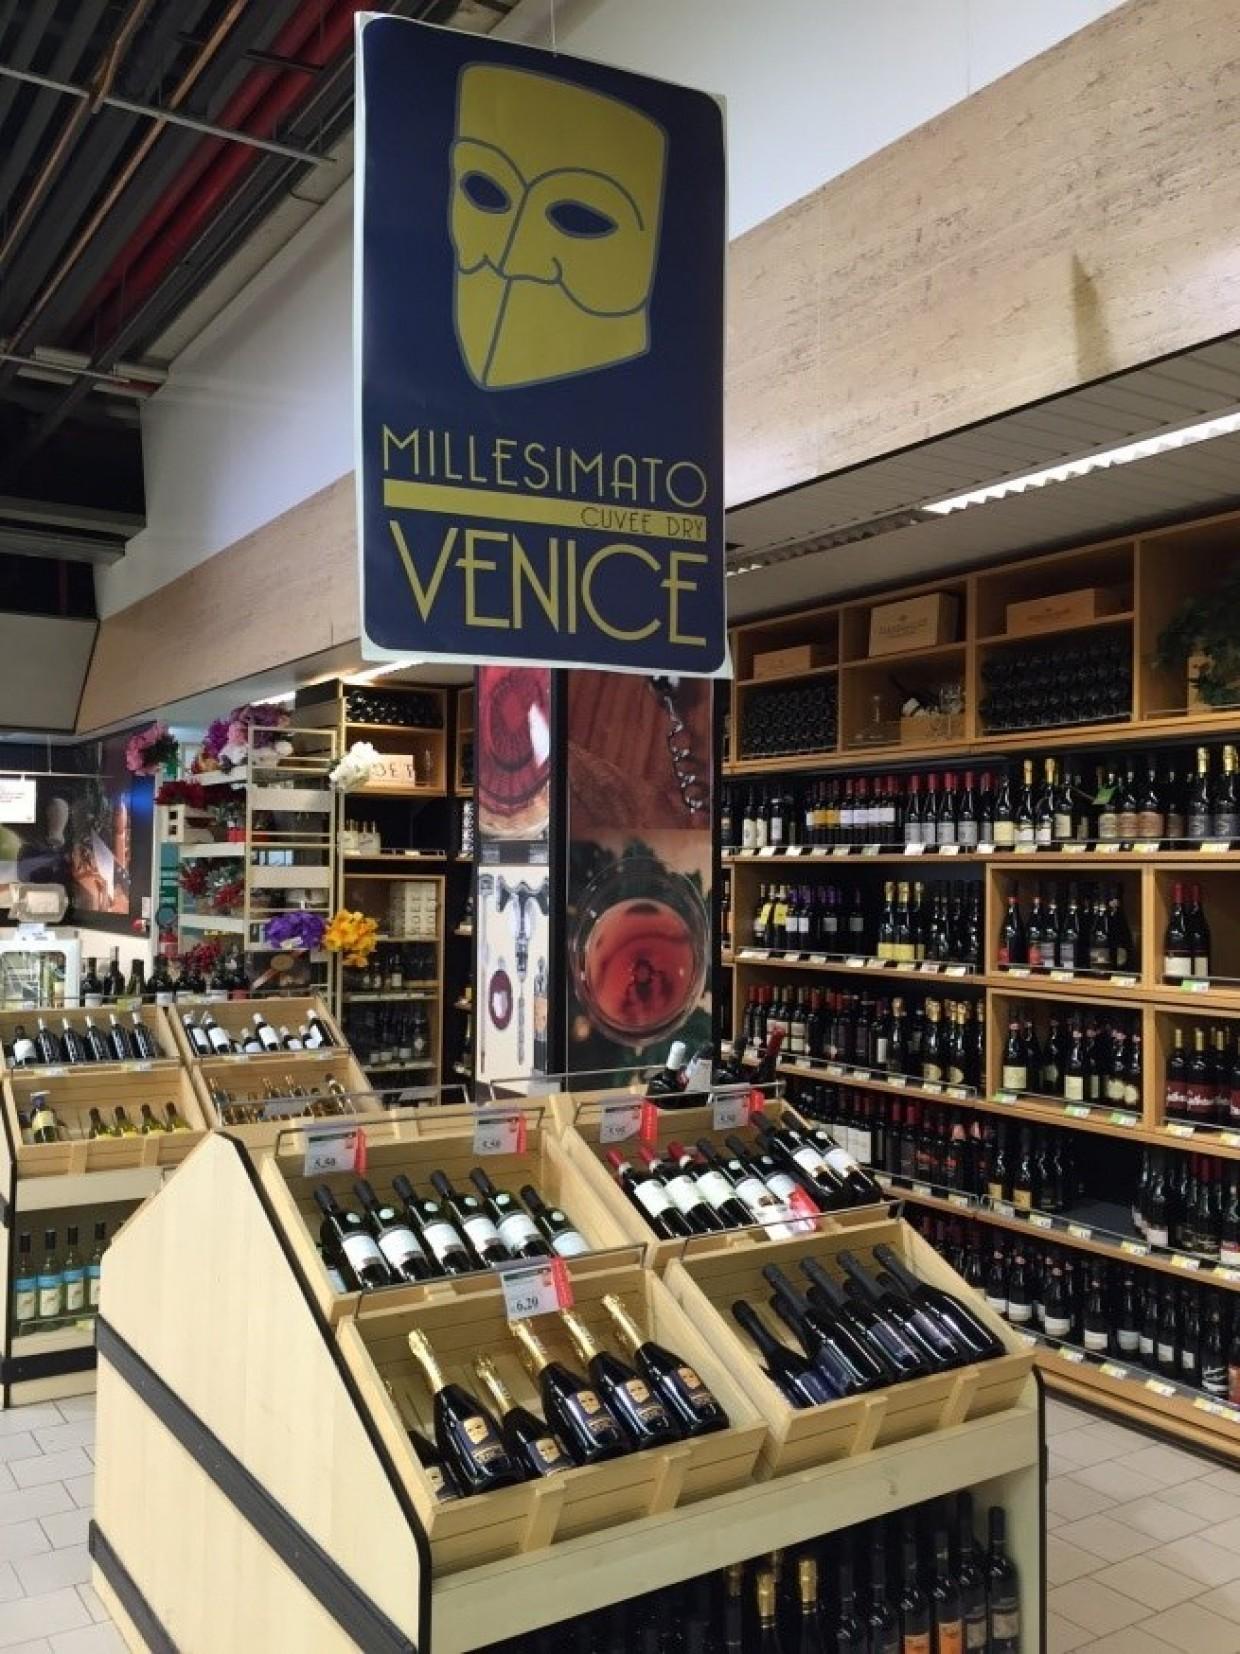 La cooperativa Gelsi presenta il Venice Cuvée